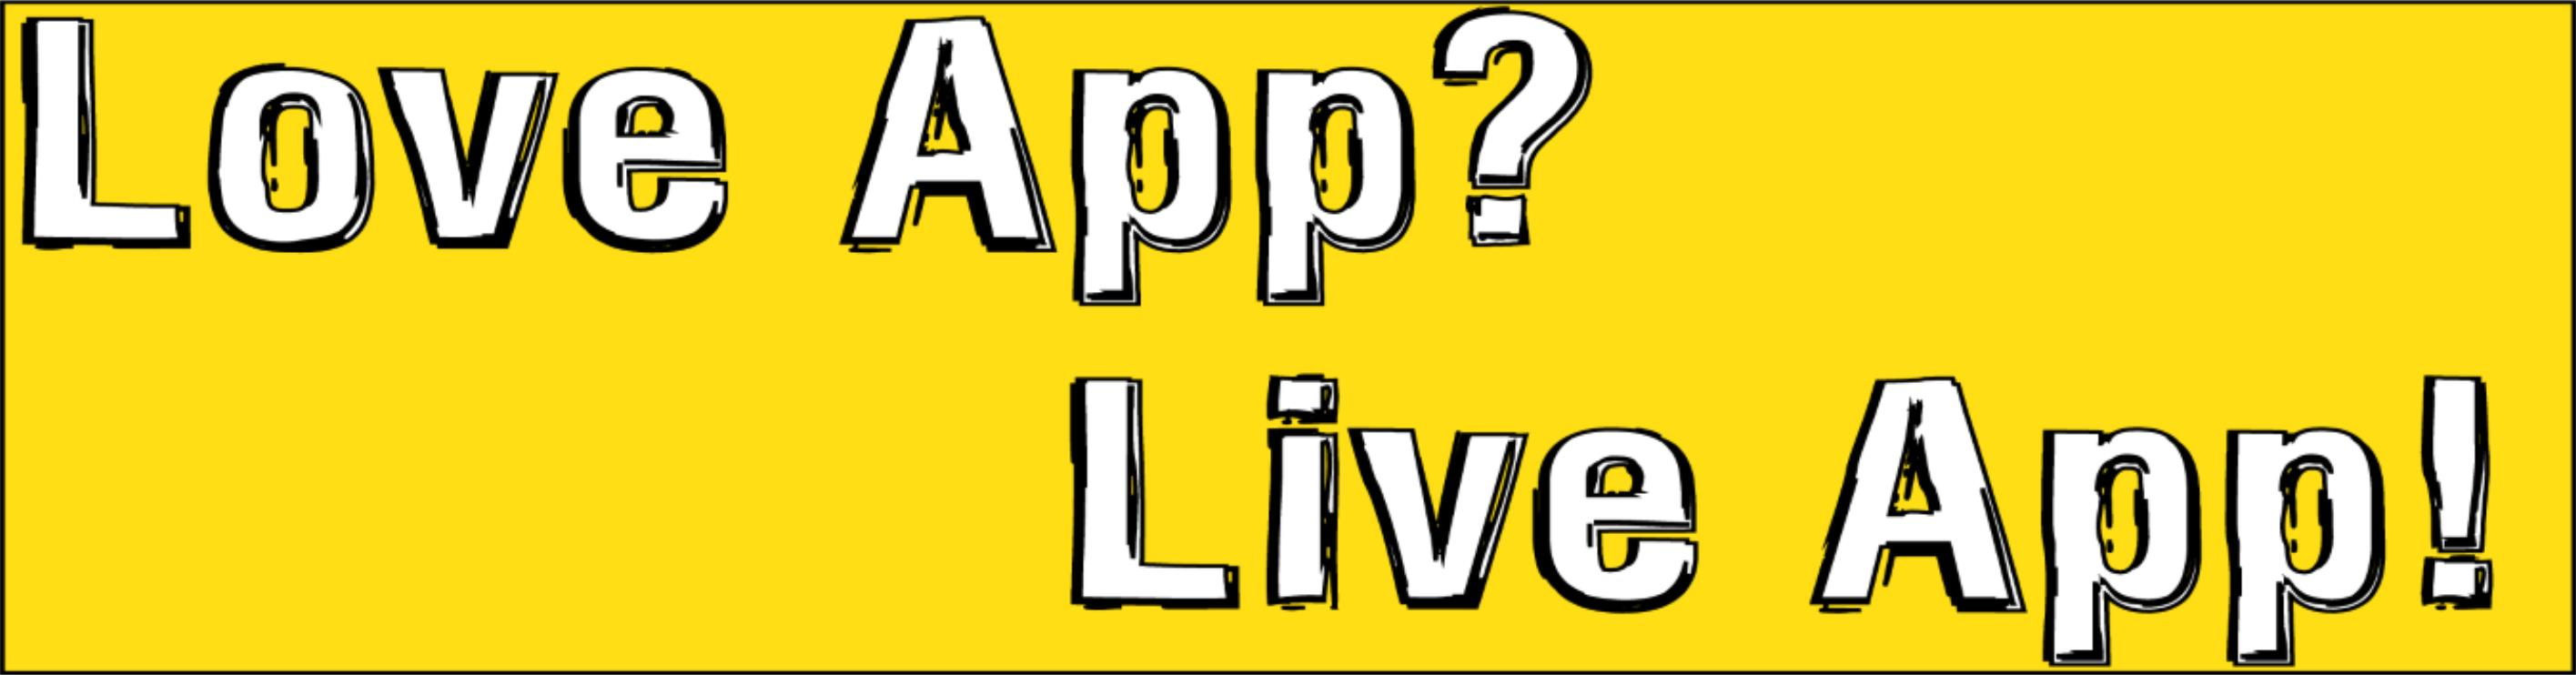 Love App Live App logo